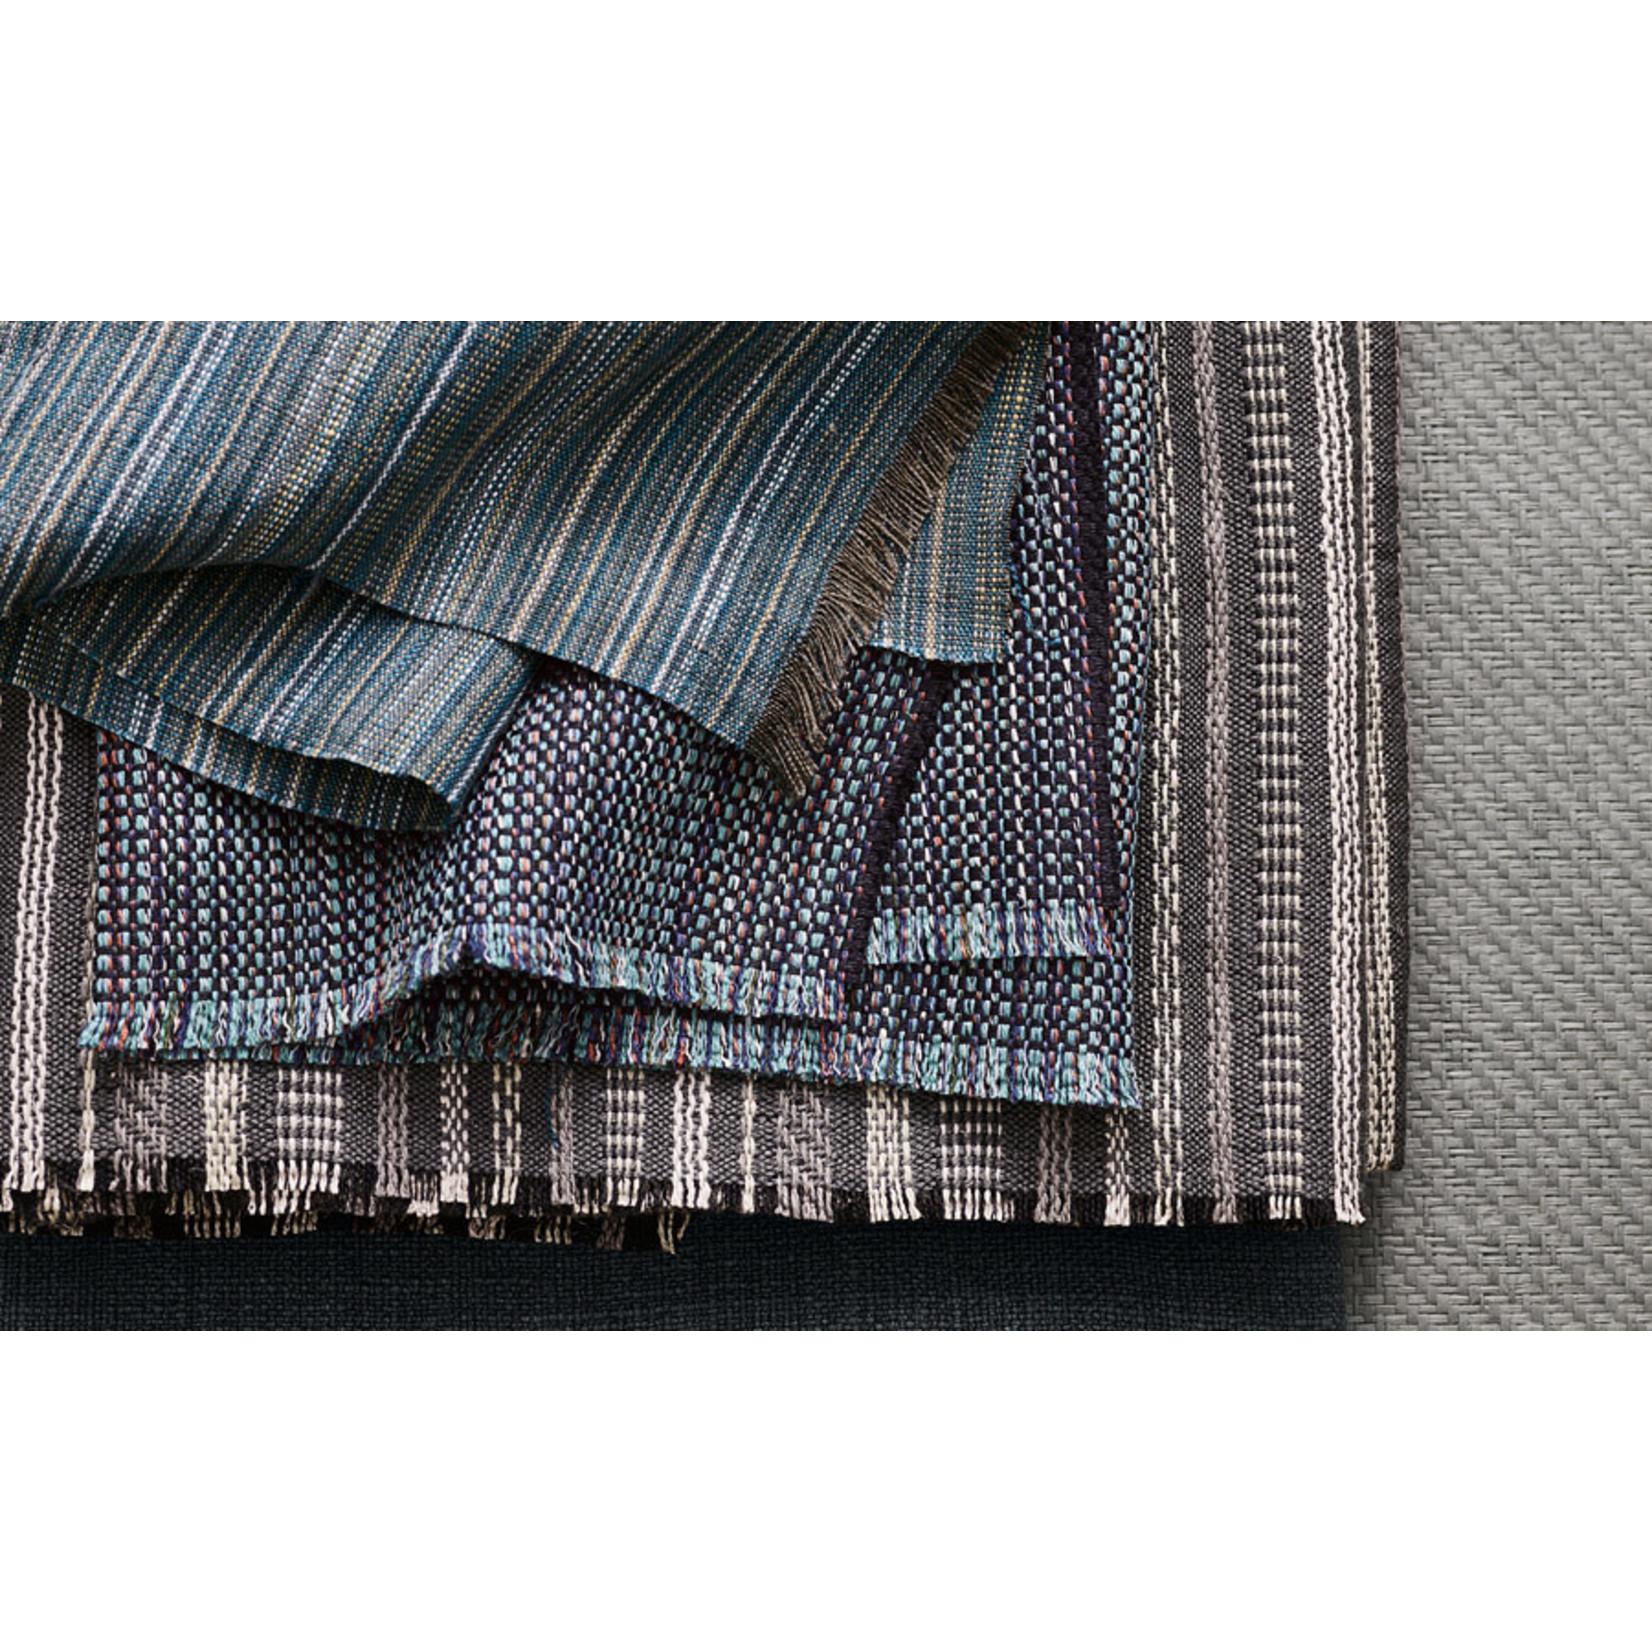 Mark Alexander Paperweave Handwoven Wallcoverings | Paper Metal